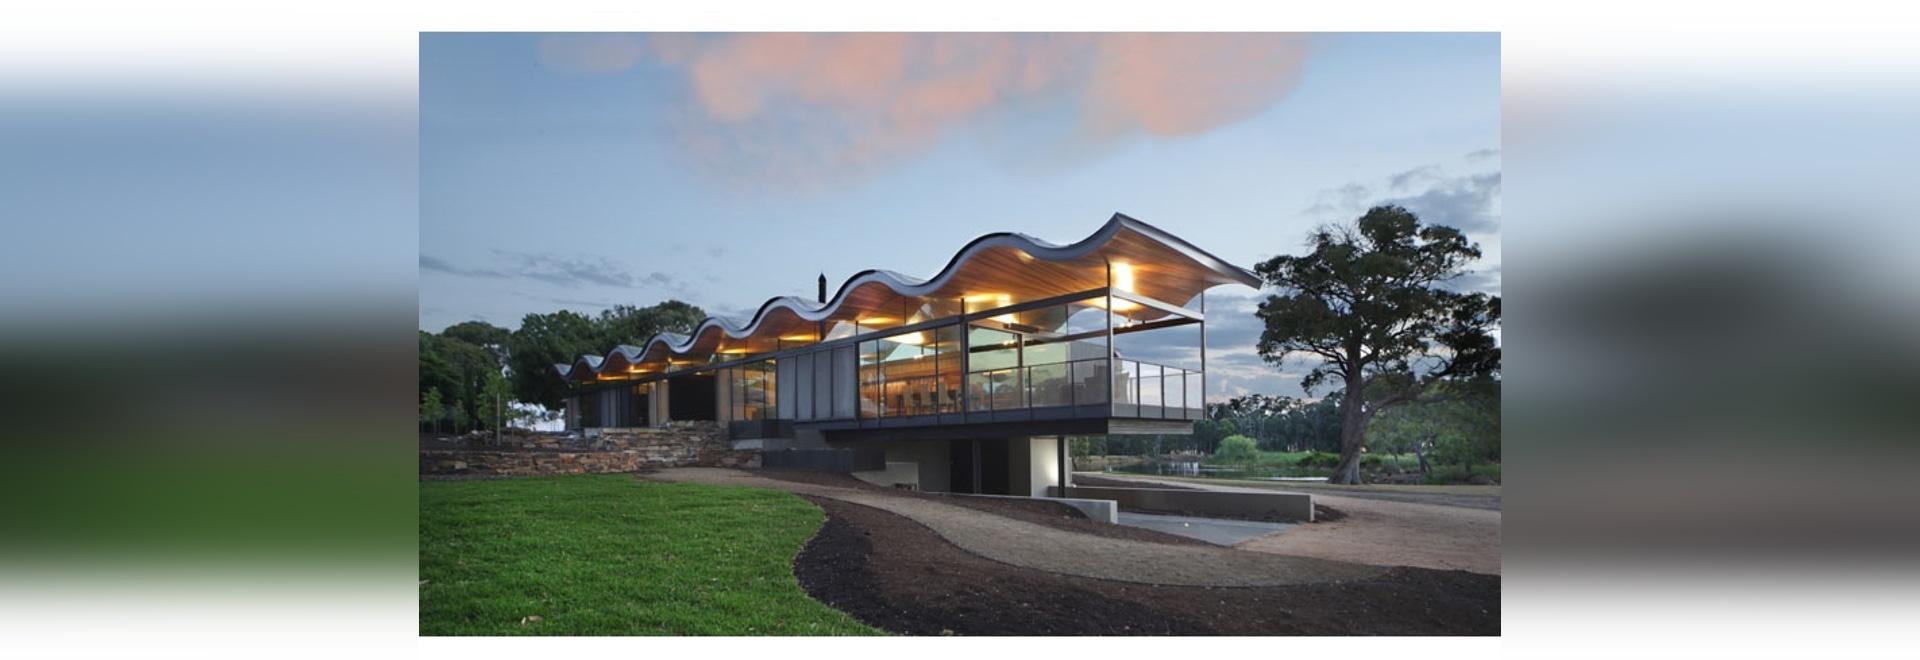 Un tejado ondulado flotante se sienta sobre esta casa australiana